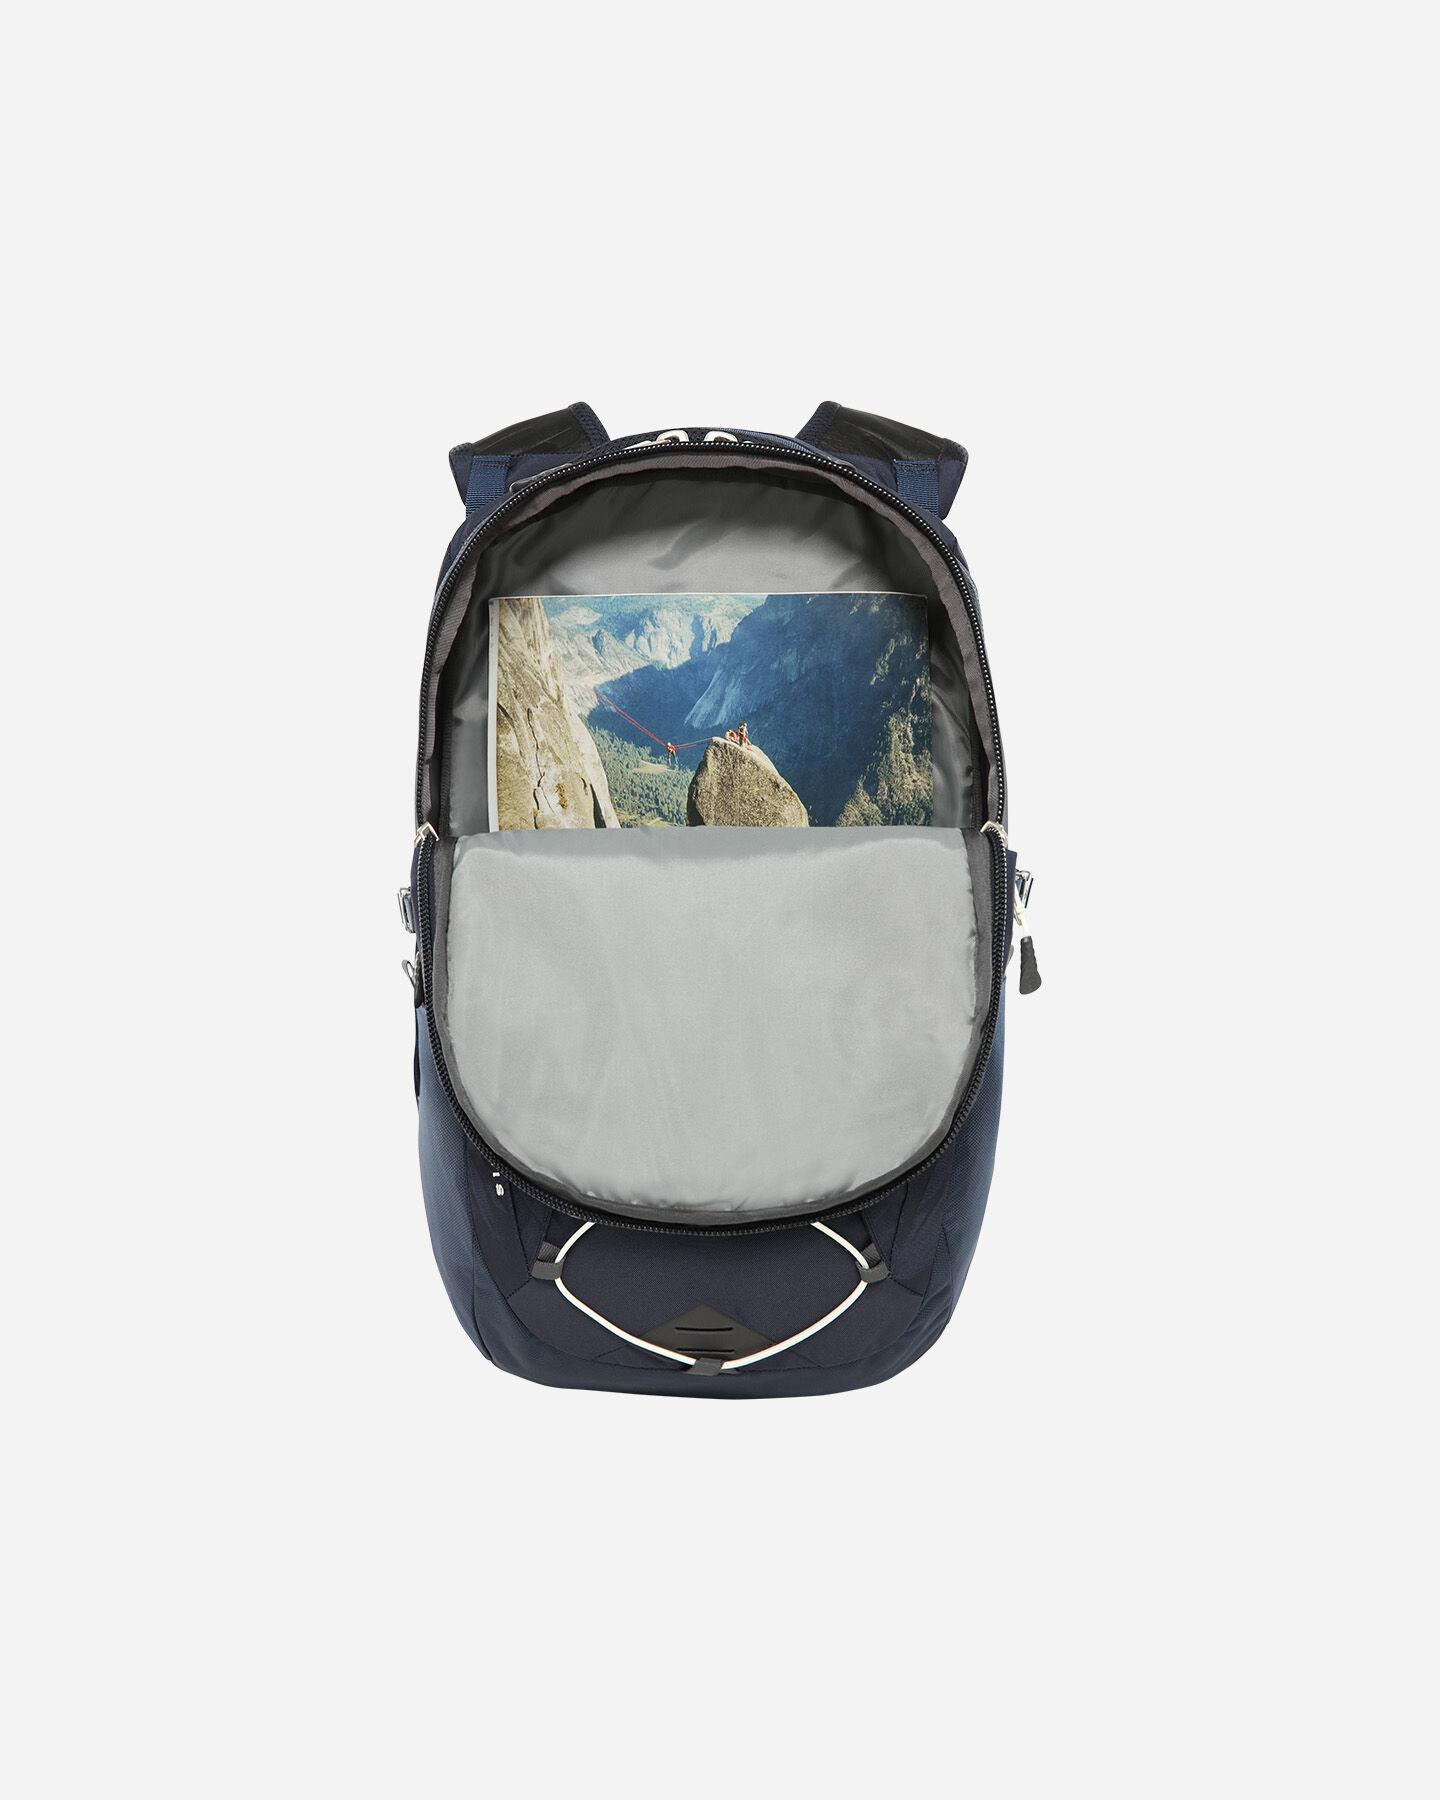 Zaino THE NORTH FACE BOREALIS S5202230 JBR OS scatto 3